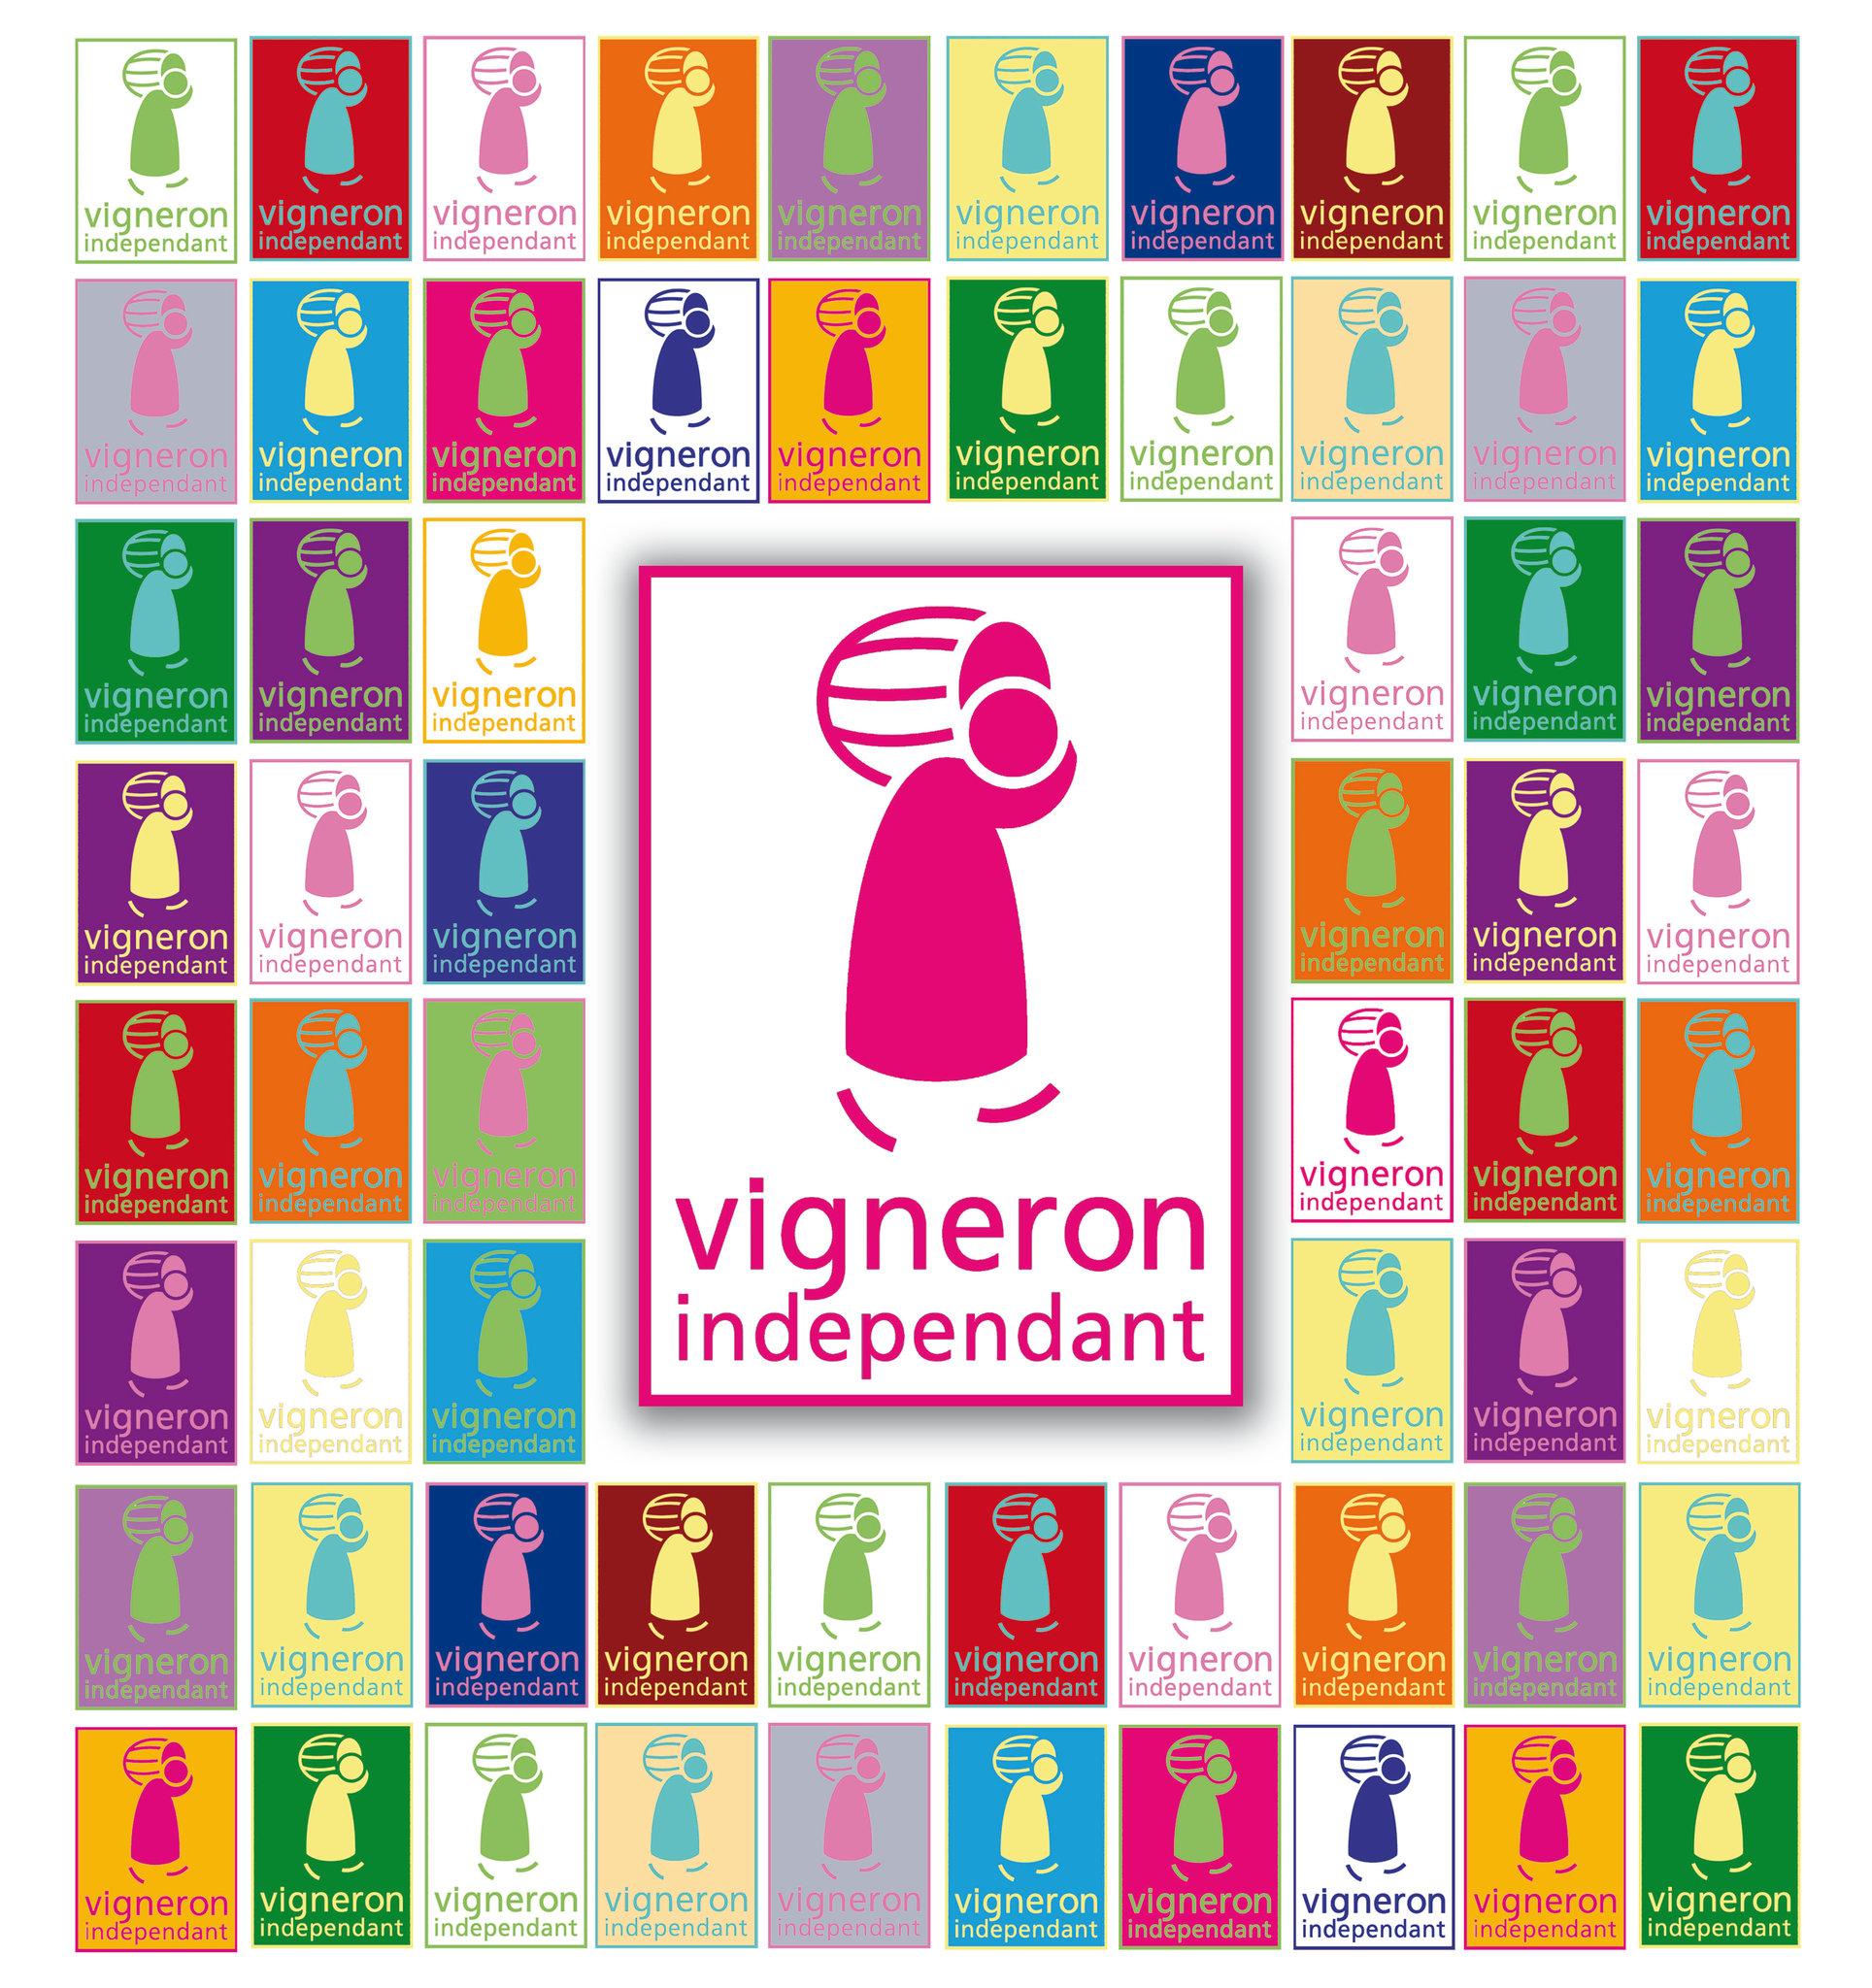 logo vignerons independants